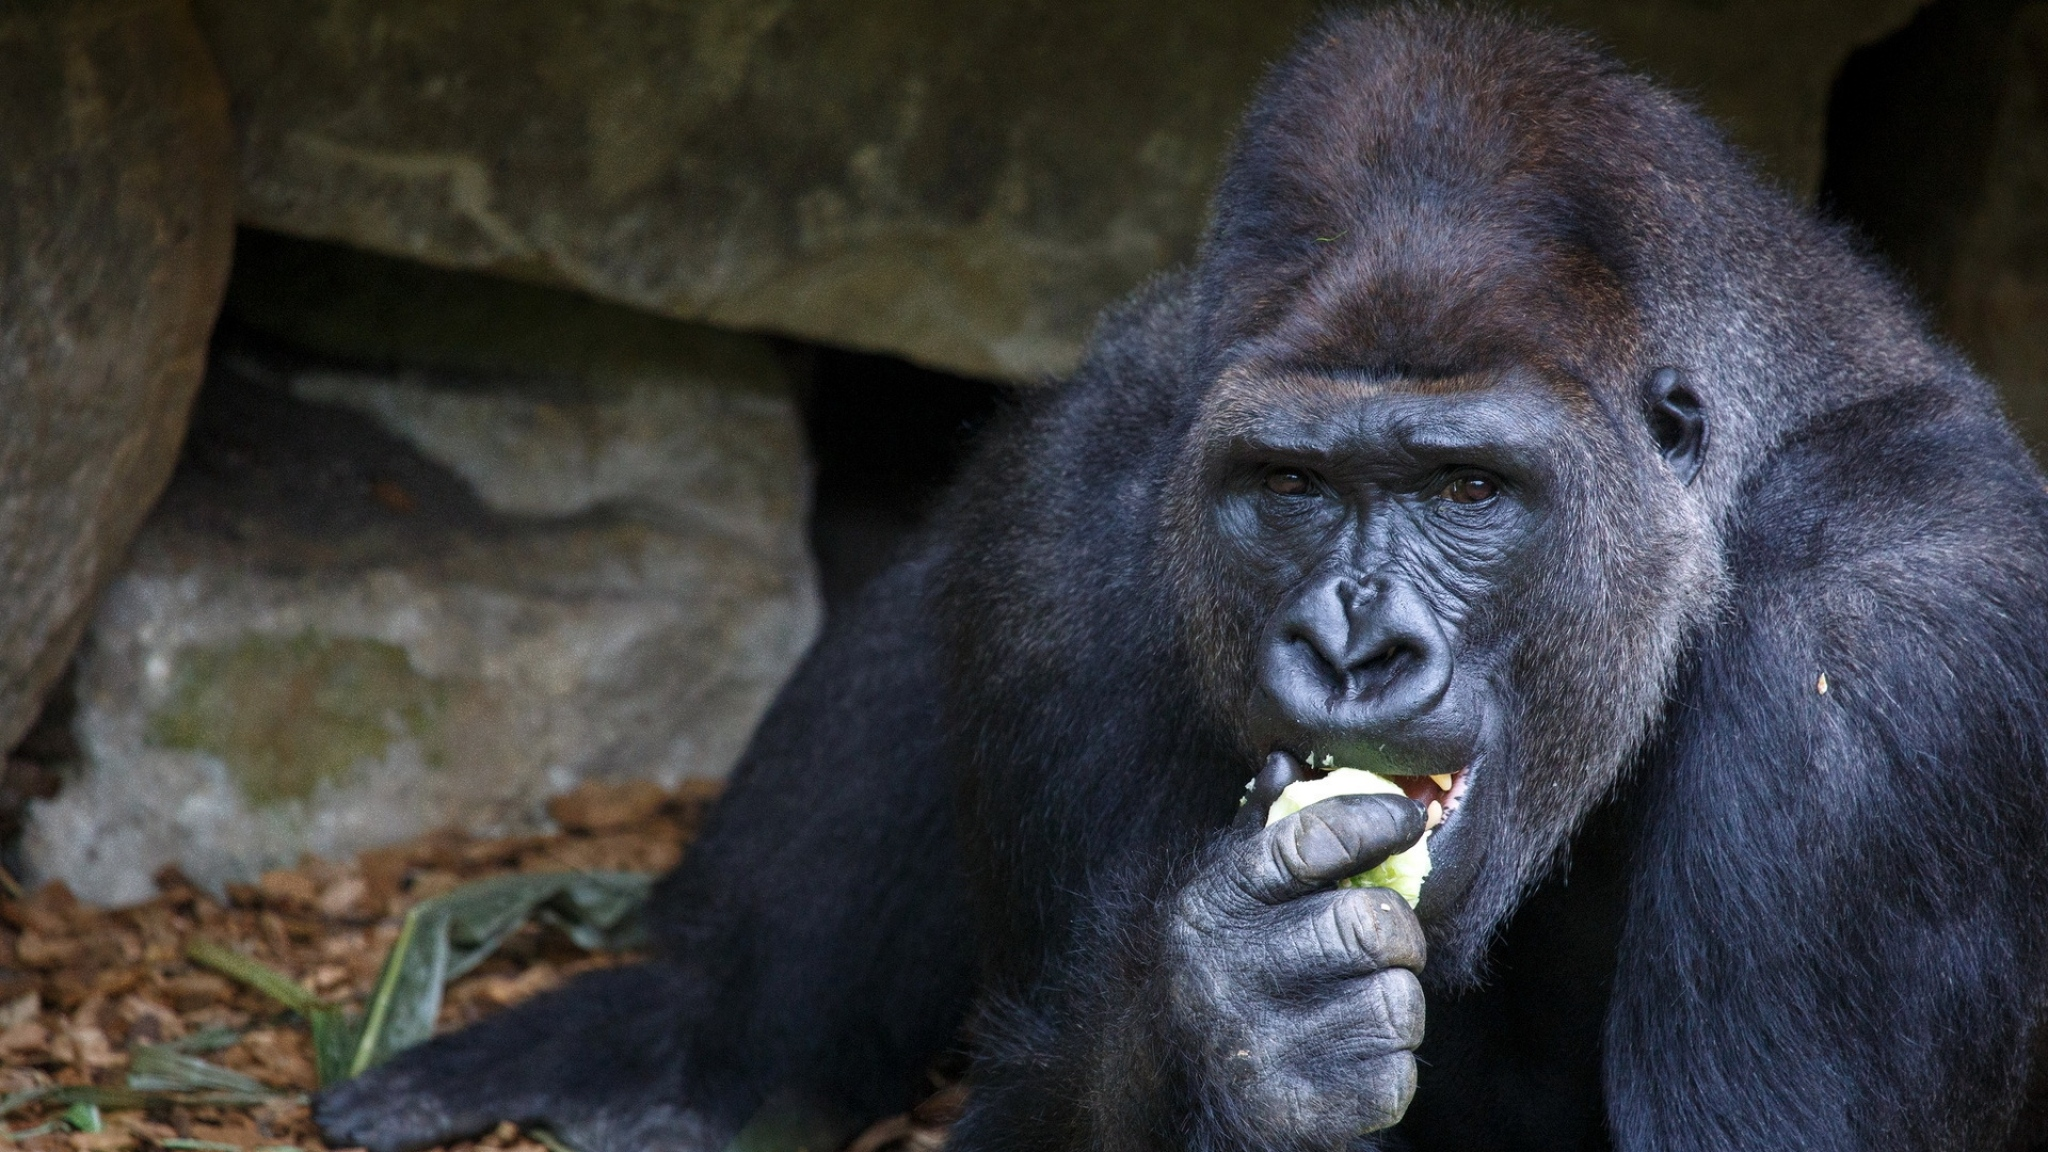 gorilla animal desktop wallpaper 661